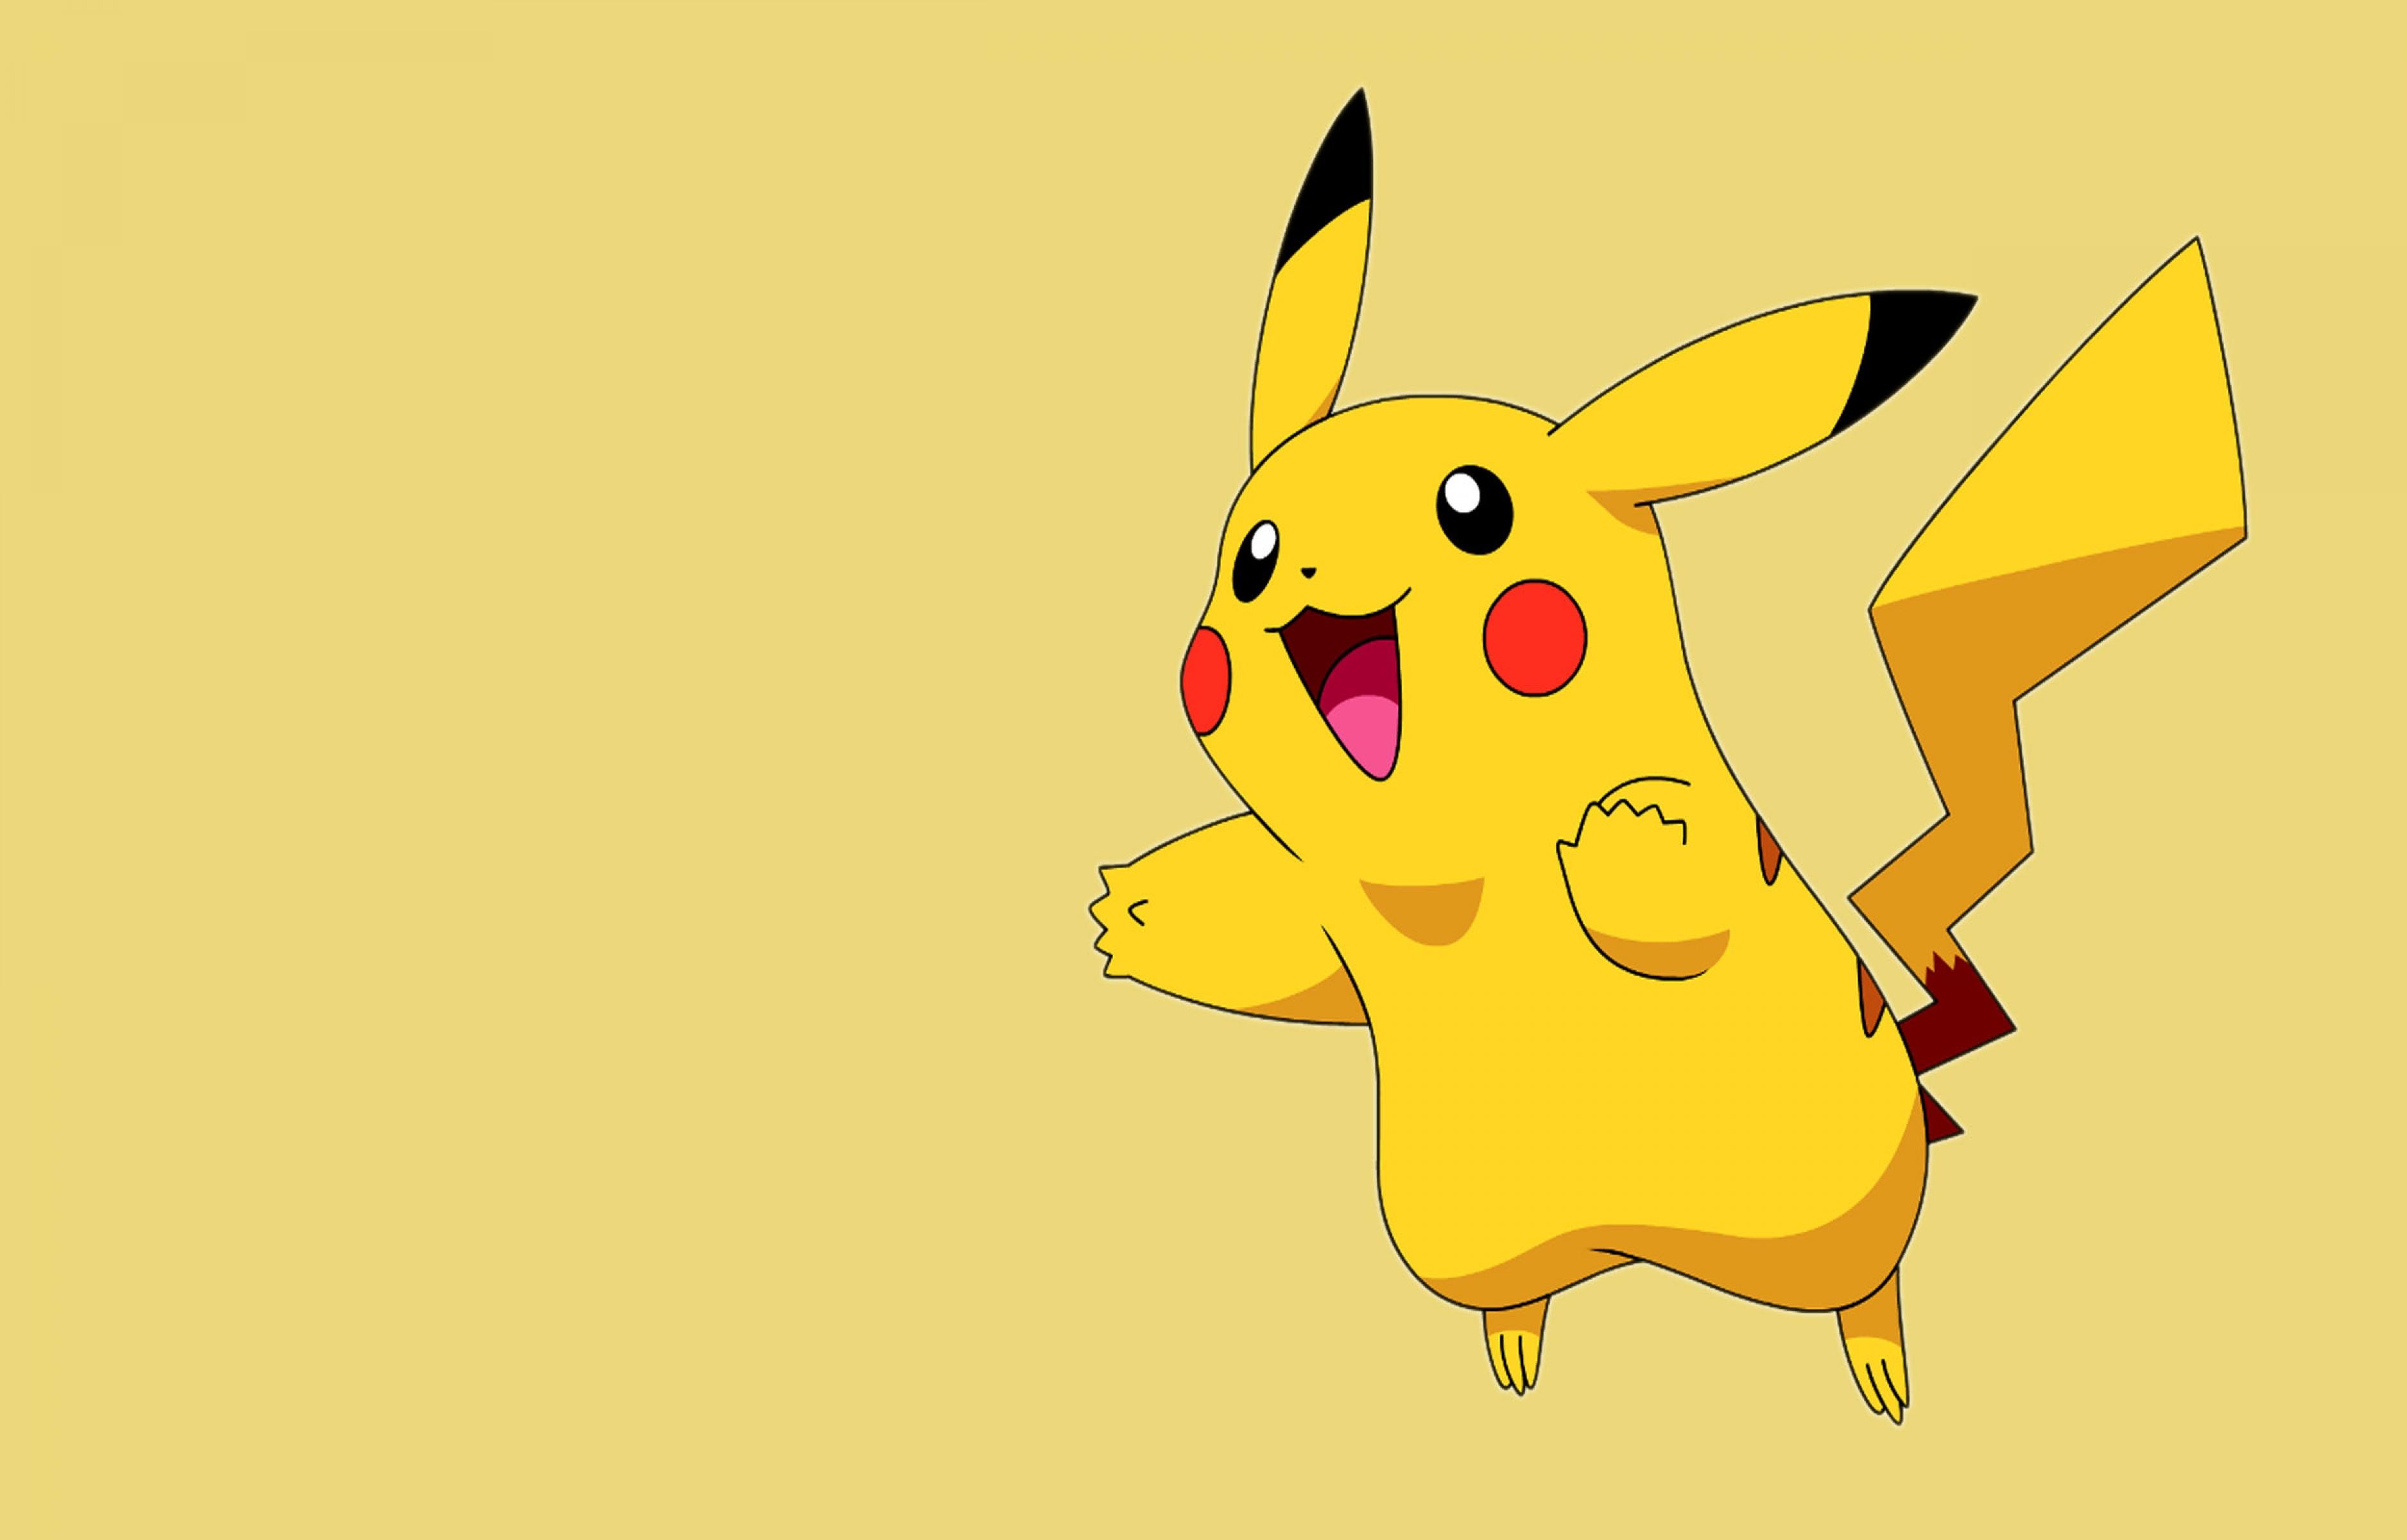 4k pikachu wallpapers high quality download free - Image pikachu ...